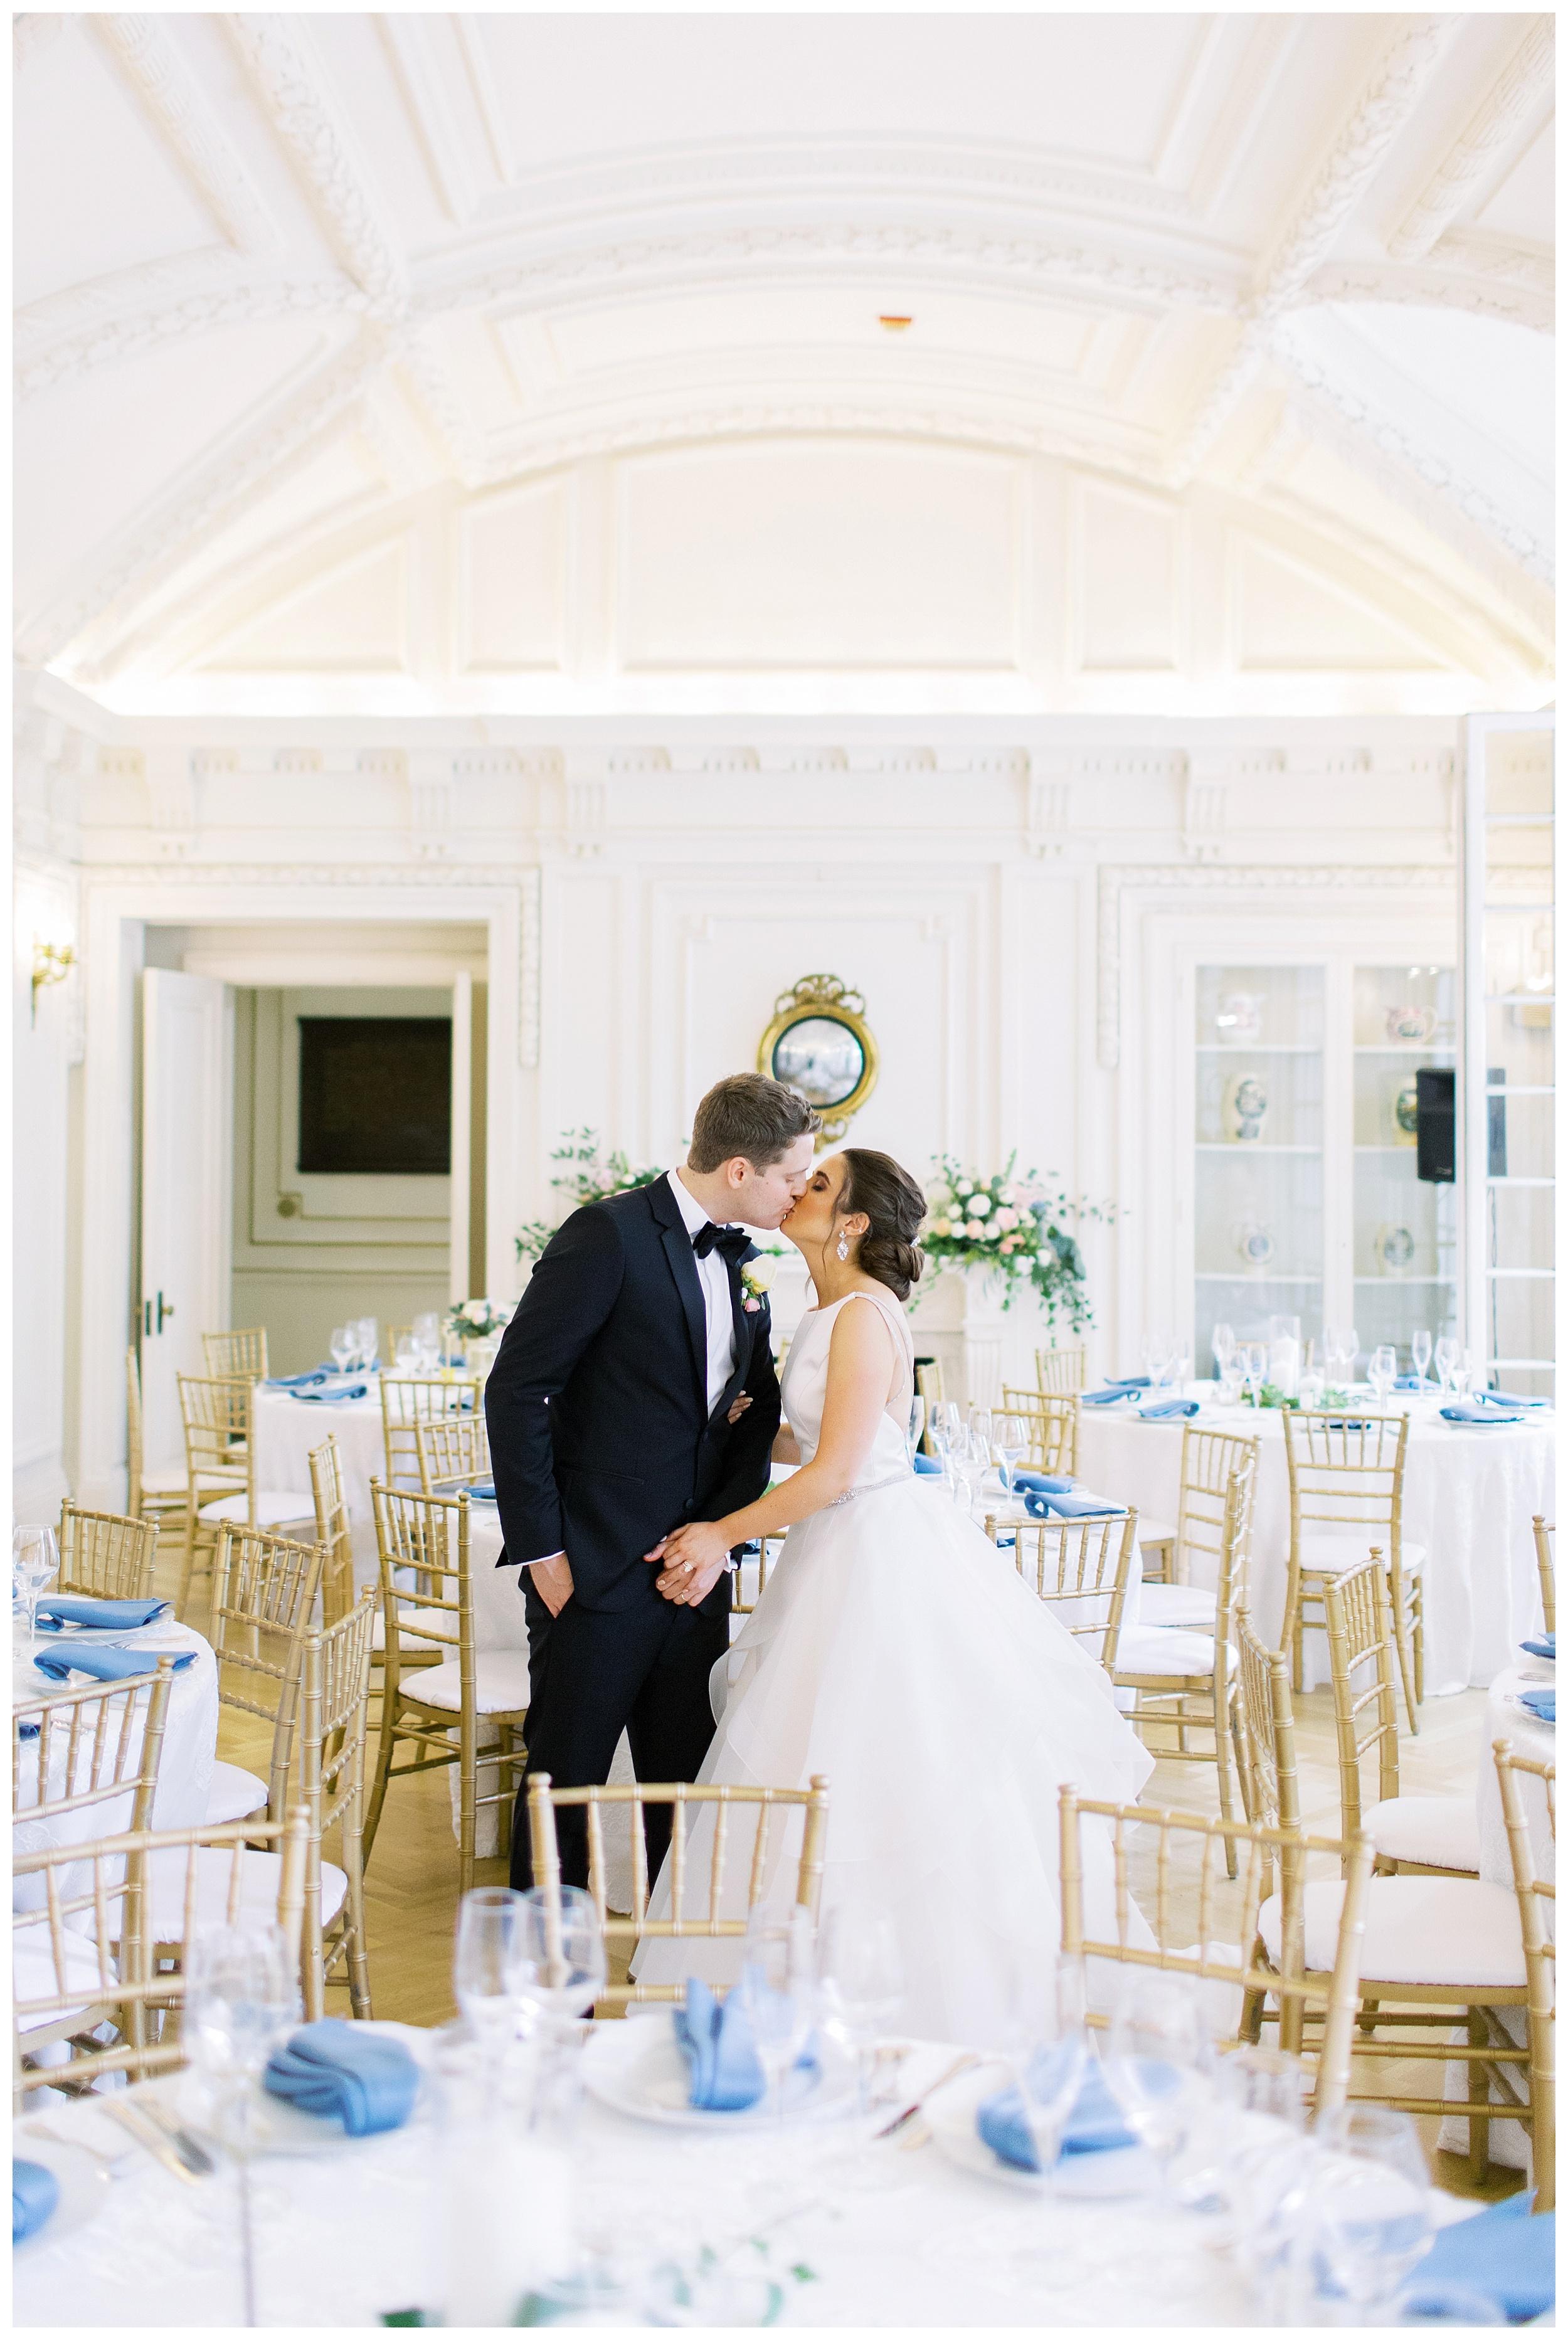 DAR Constitution Hall Wedding Wedding | Daughters of the American Revolution Wedding | District of Columbia Film Wedding Photographer Kir Tuben_0122.jpg